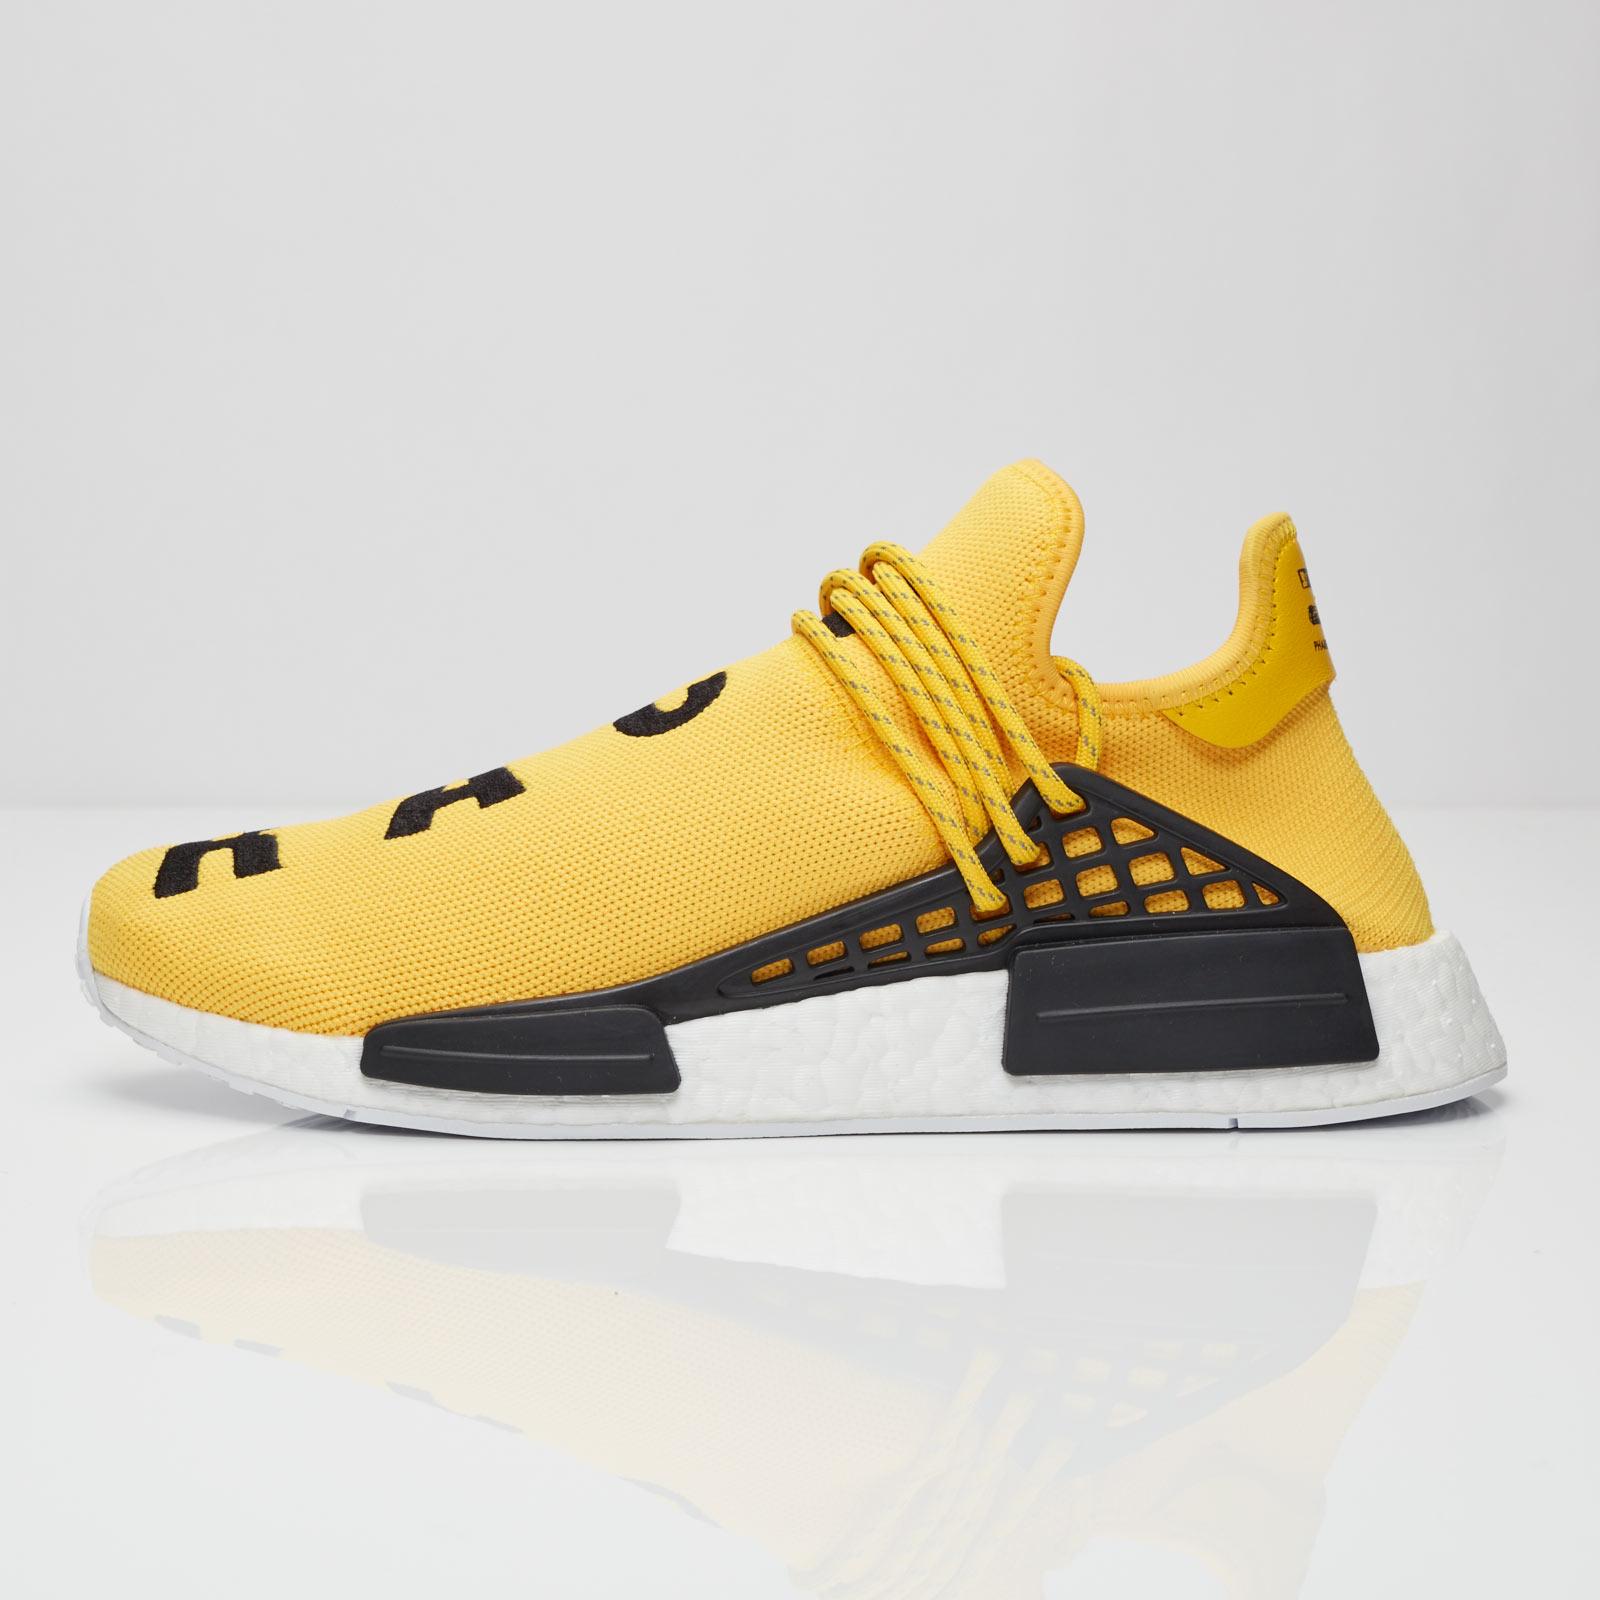 d777fb67a0a33 adidas PW Human Race NMD - Bb0619 - Sneakersnstuff